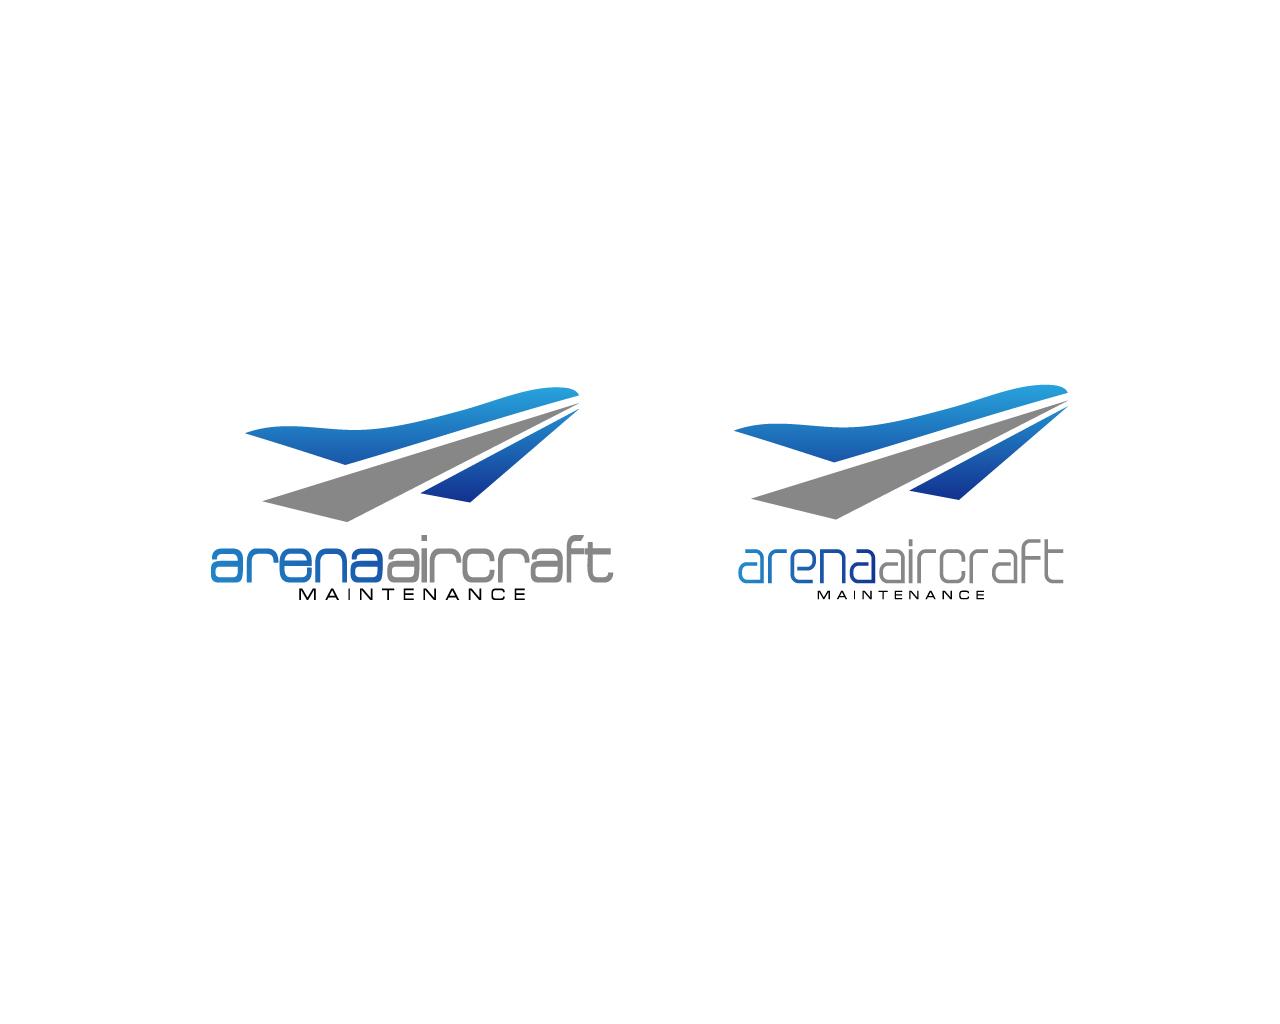 Aircraft Maintenance Logos Images